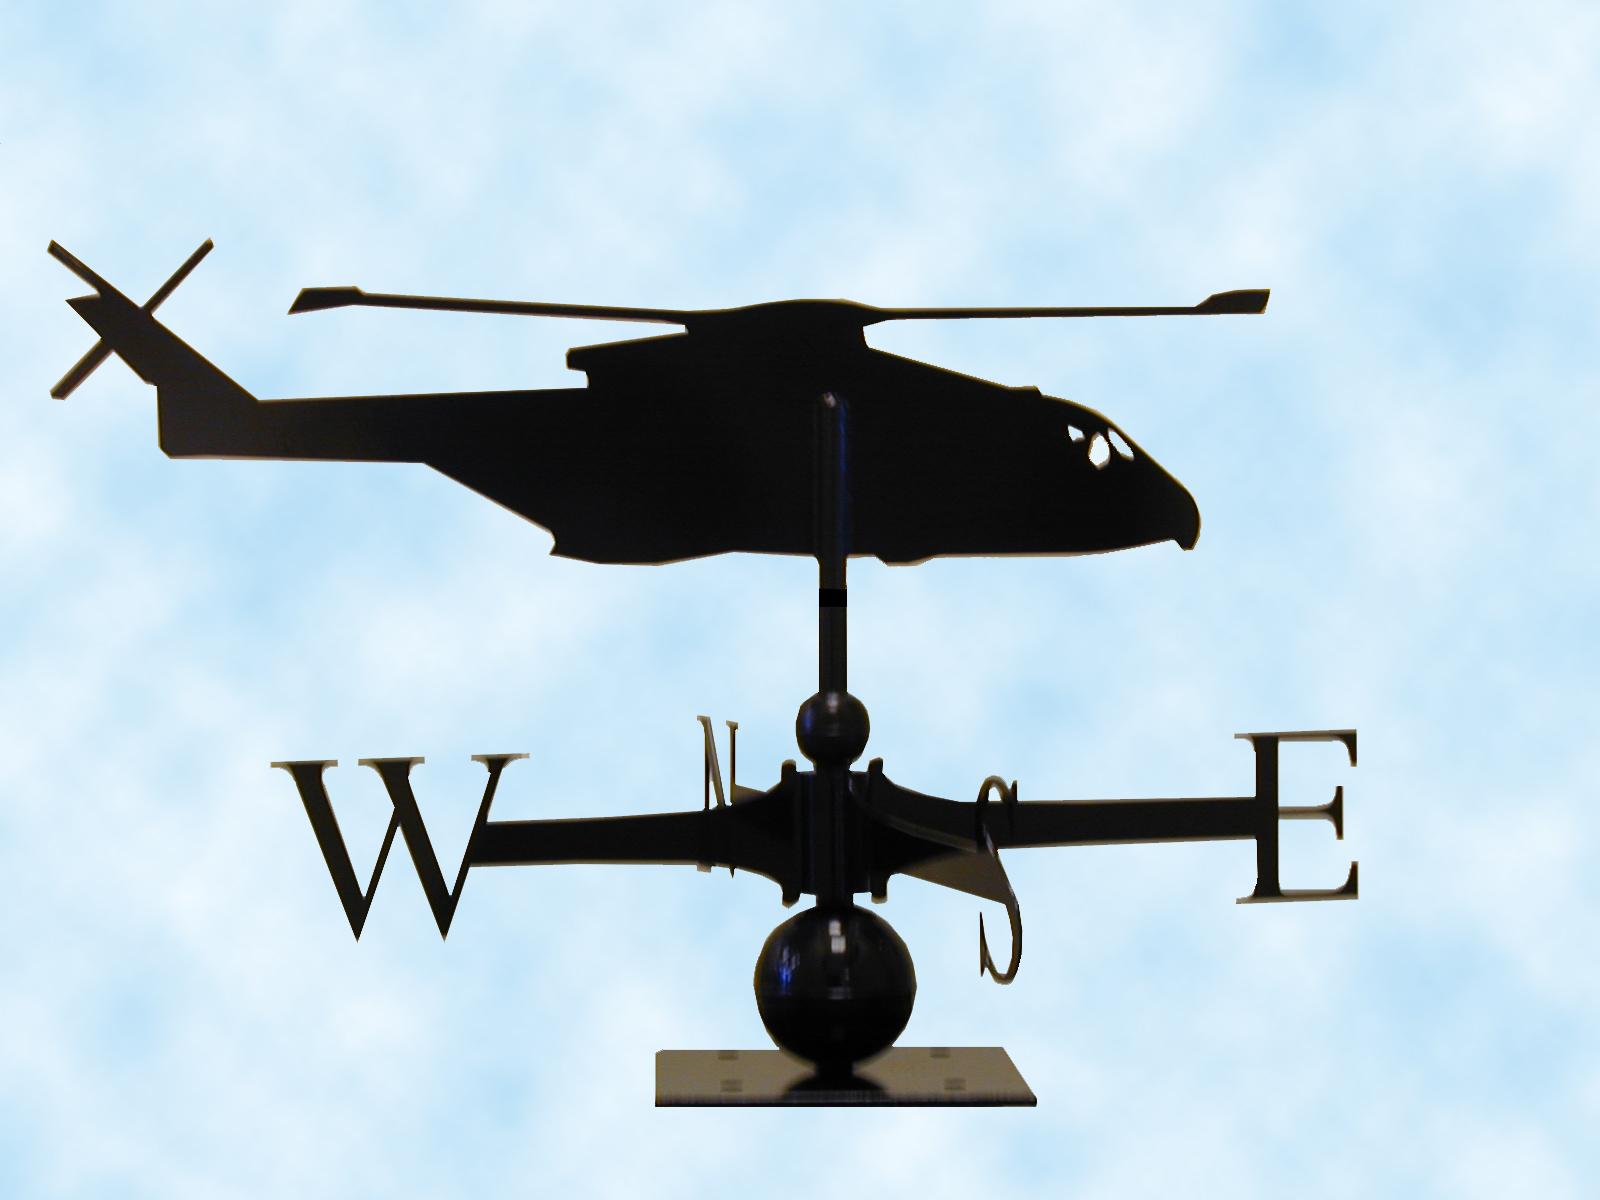 Weathervane - Merlin helicopter